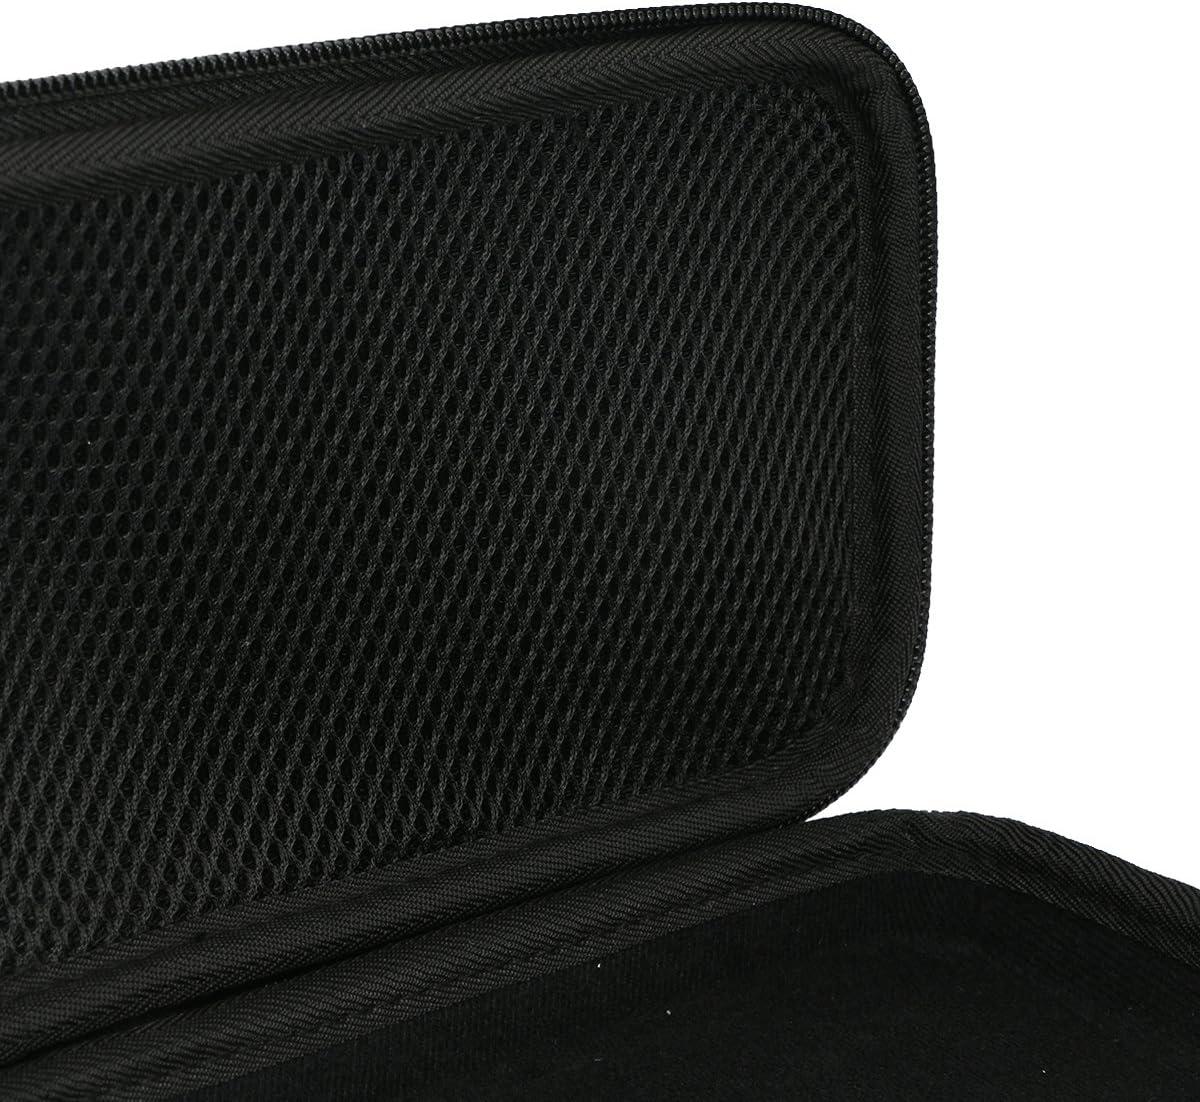 Hard Case For M-Audio Keystation Mini 32 II Ultra-Portable 32-Key USB MIDI Keyboard Controller by Khanka